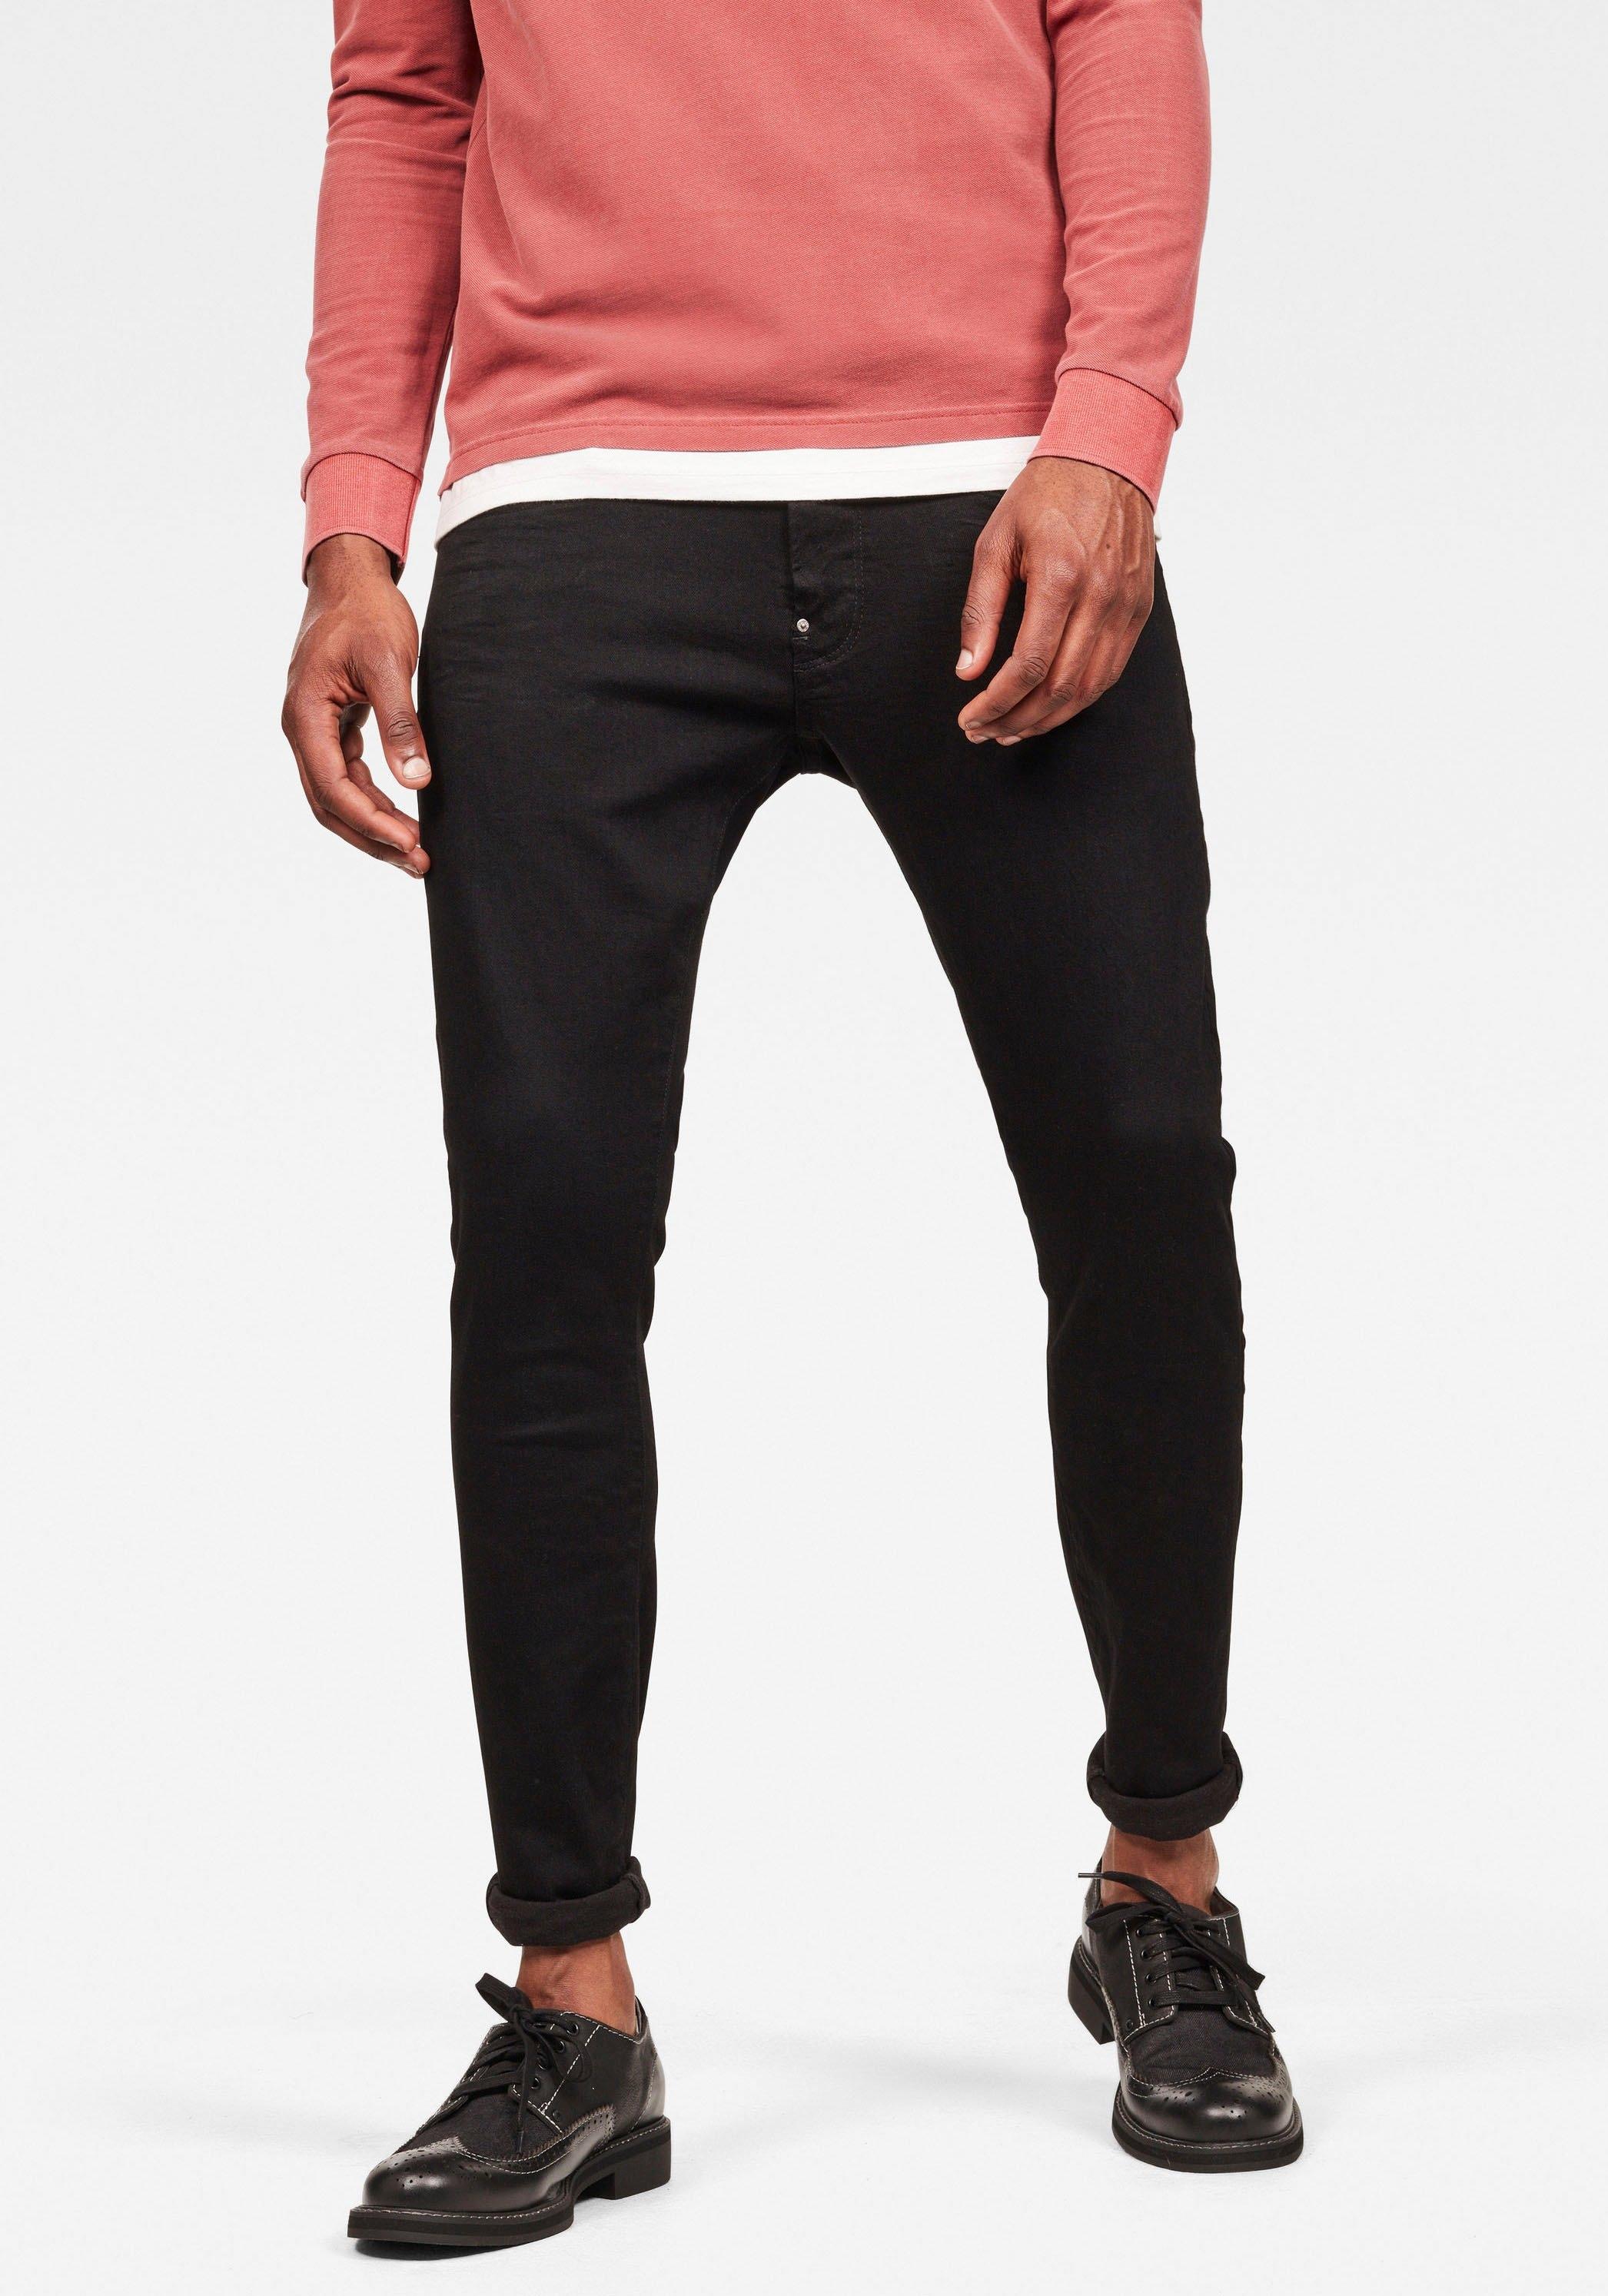 G-Star RAW G-STAR Slim Fit-jeans »Revend Super Slim« nu online kopen bij OTTO